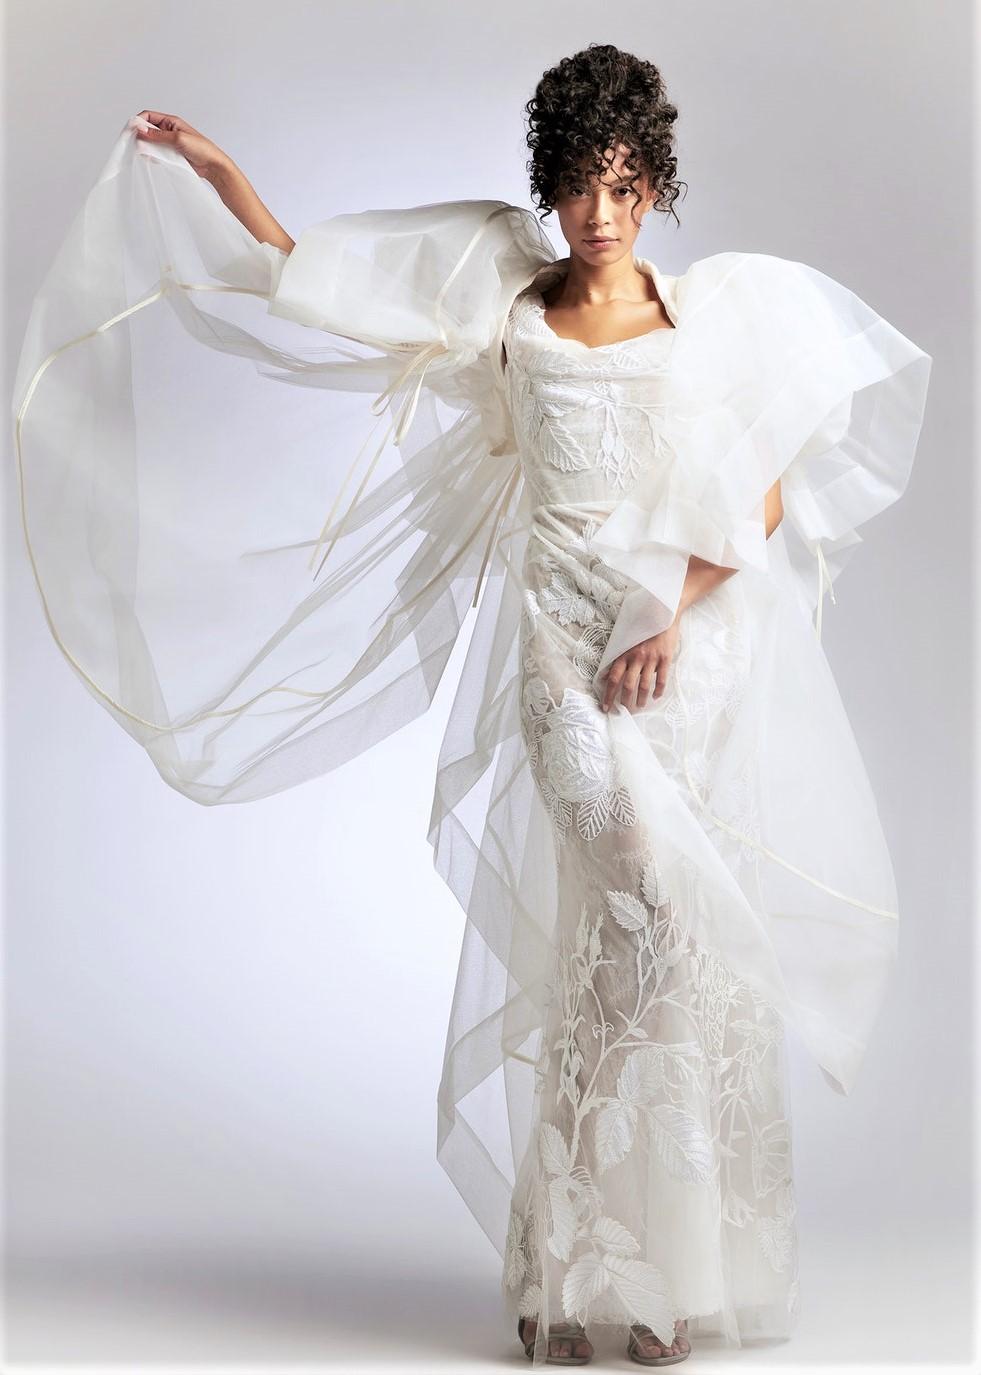 VW_Bridal_2021_Look_22_Cora Cocotte Dress Vivienne Westwood Pynck (2) cropped.jpg